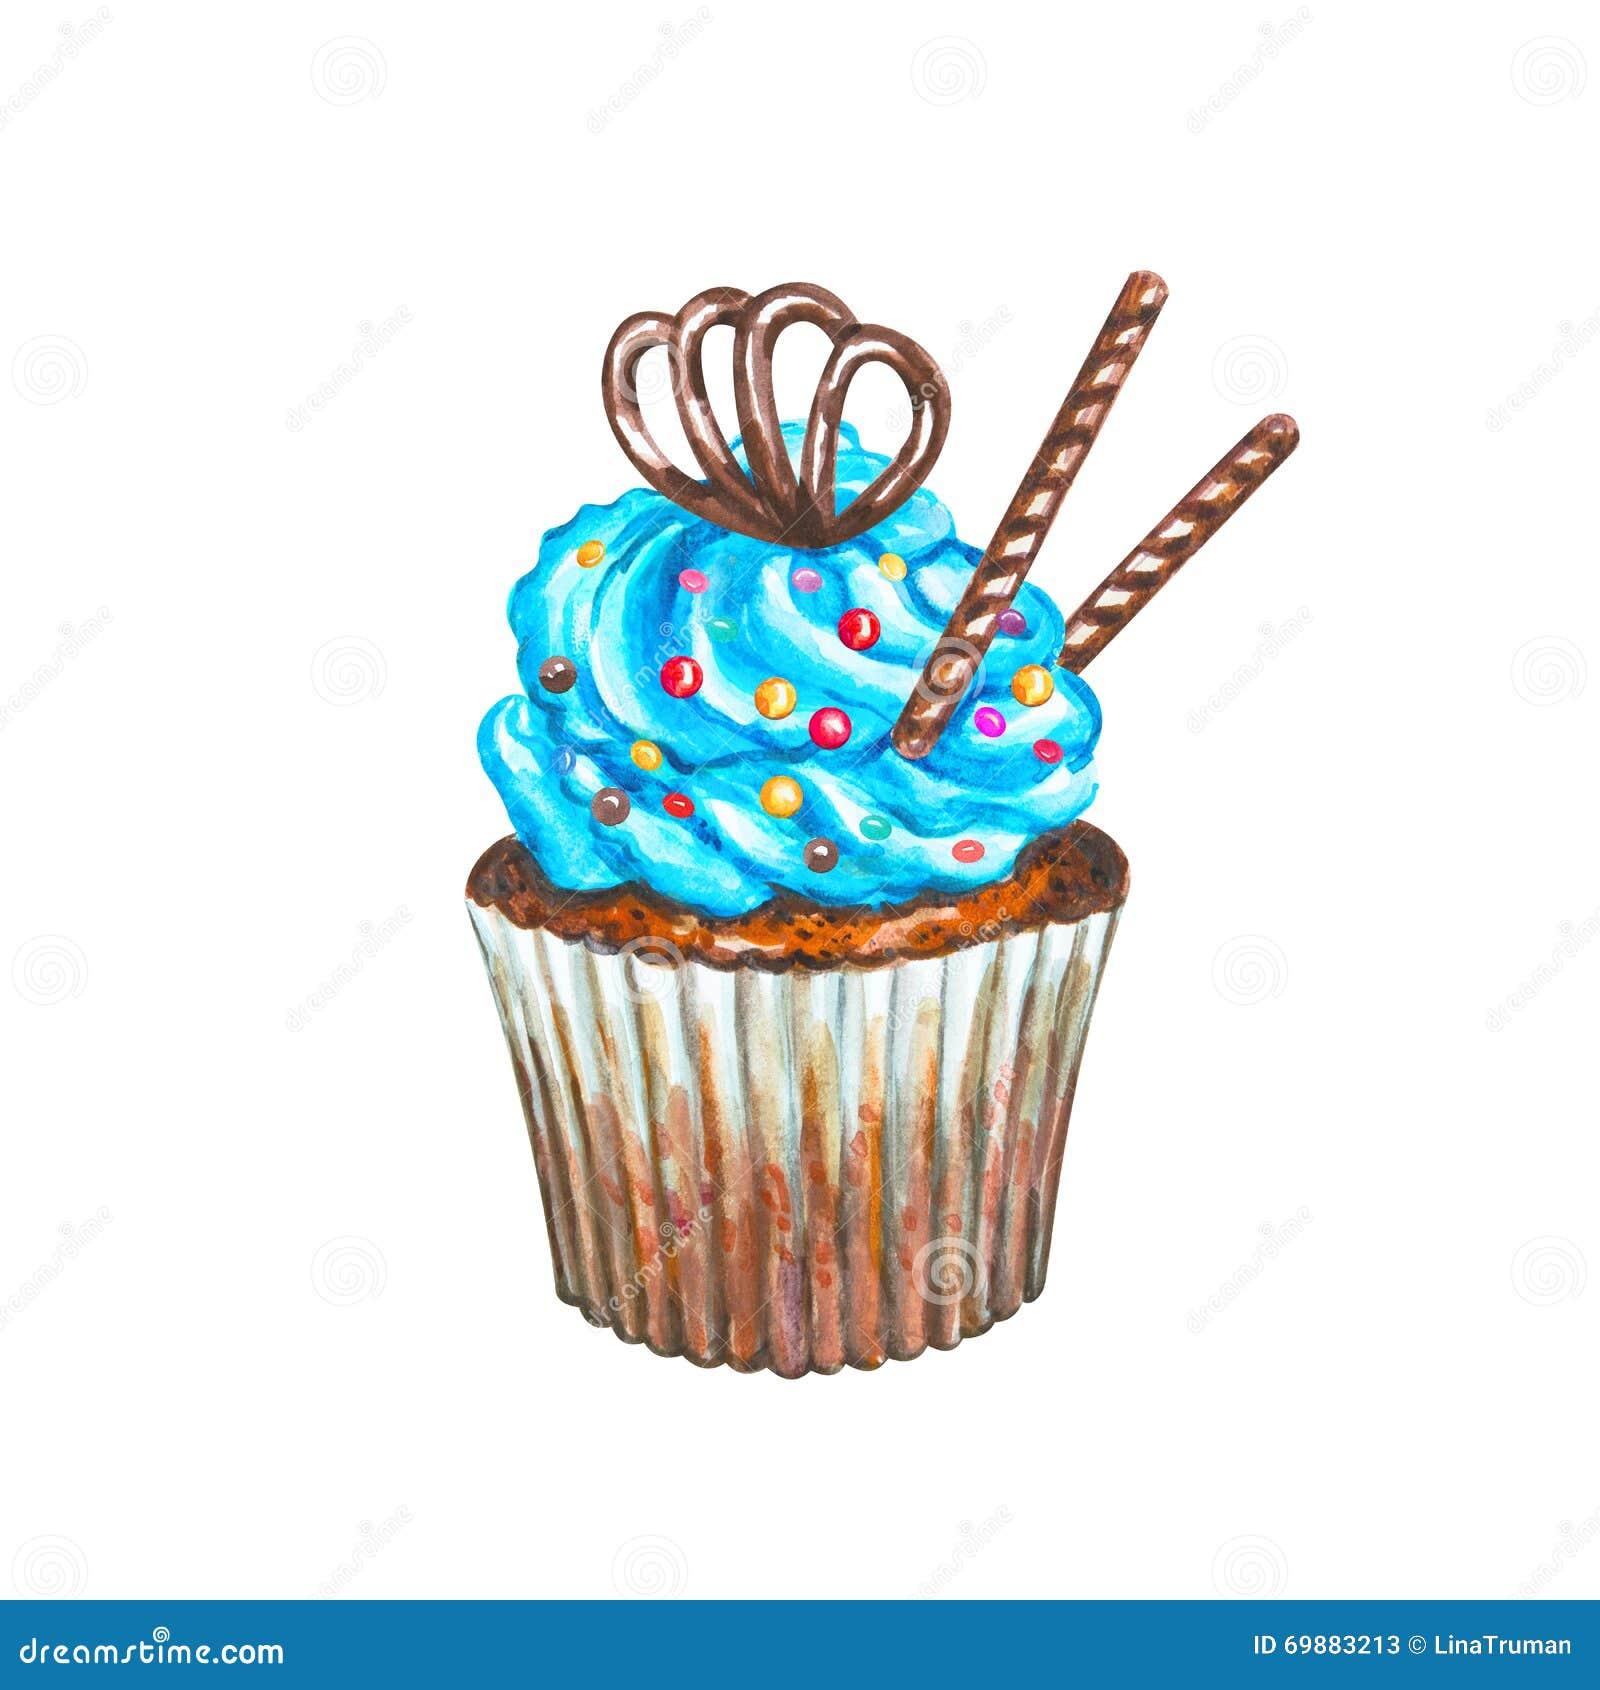 Watercolor cupcake watercolor chocolate cupcake stock illustration image 69883213 - Creme decoration cupcake ...